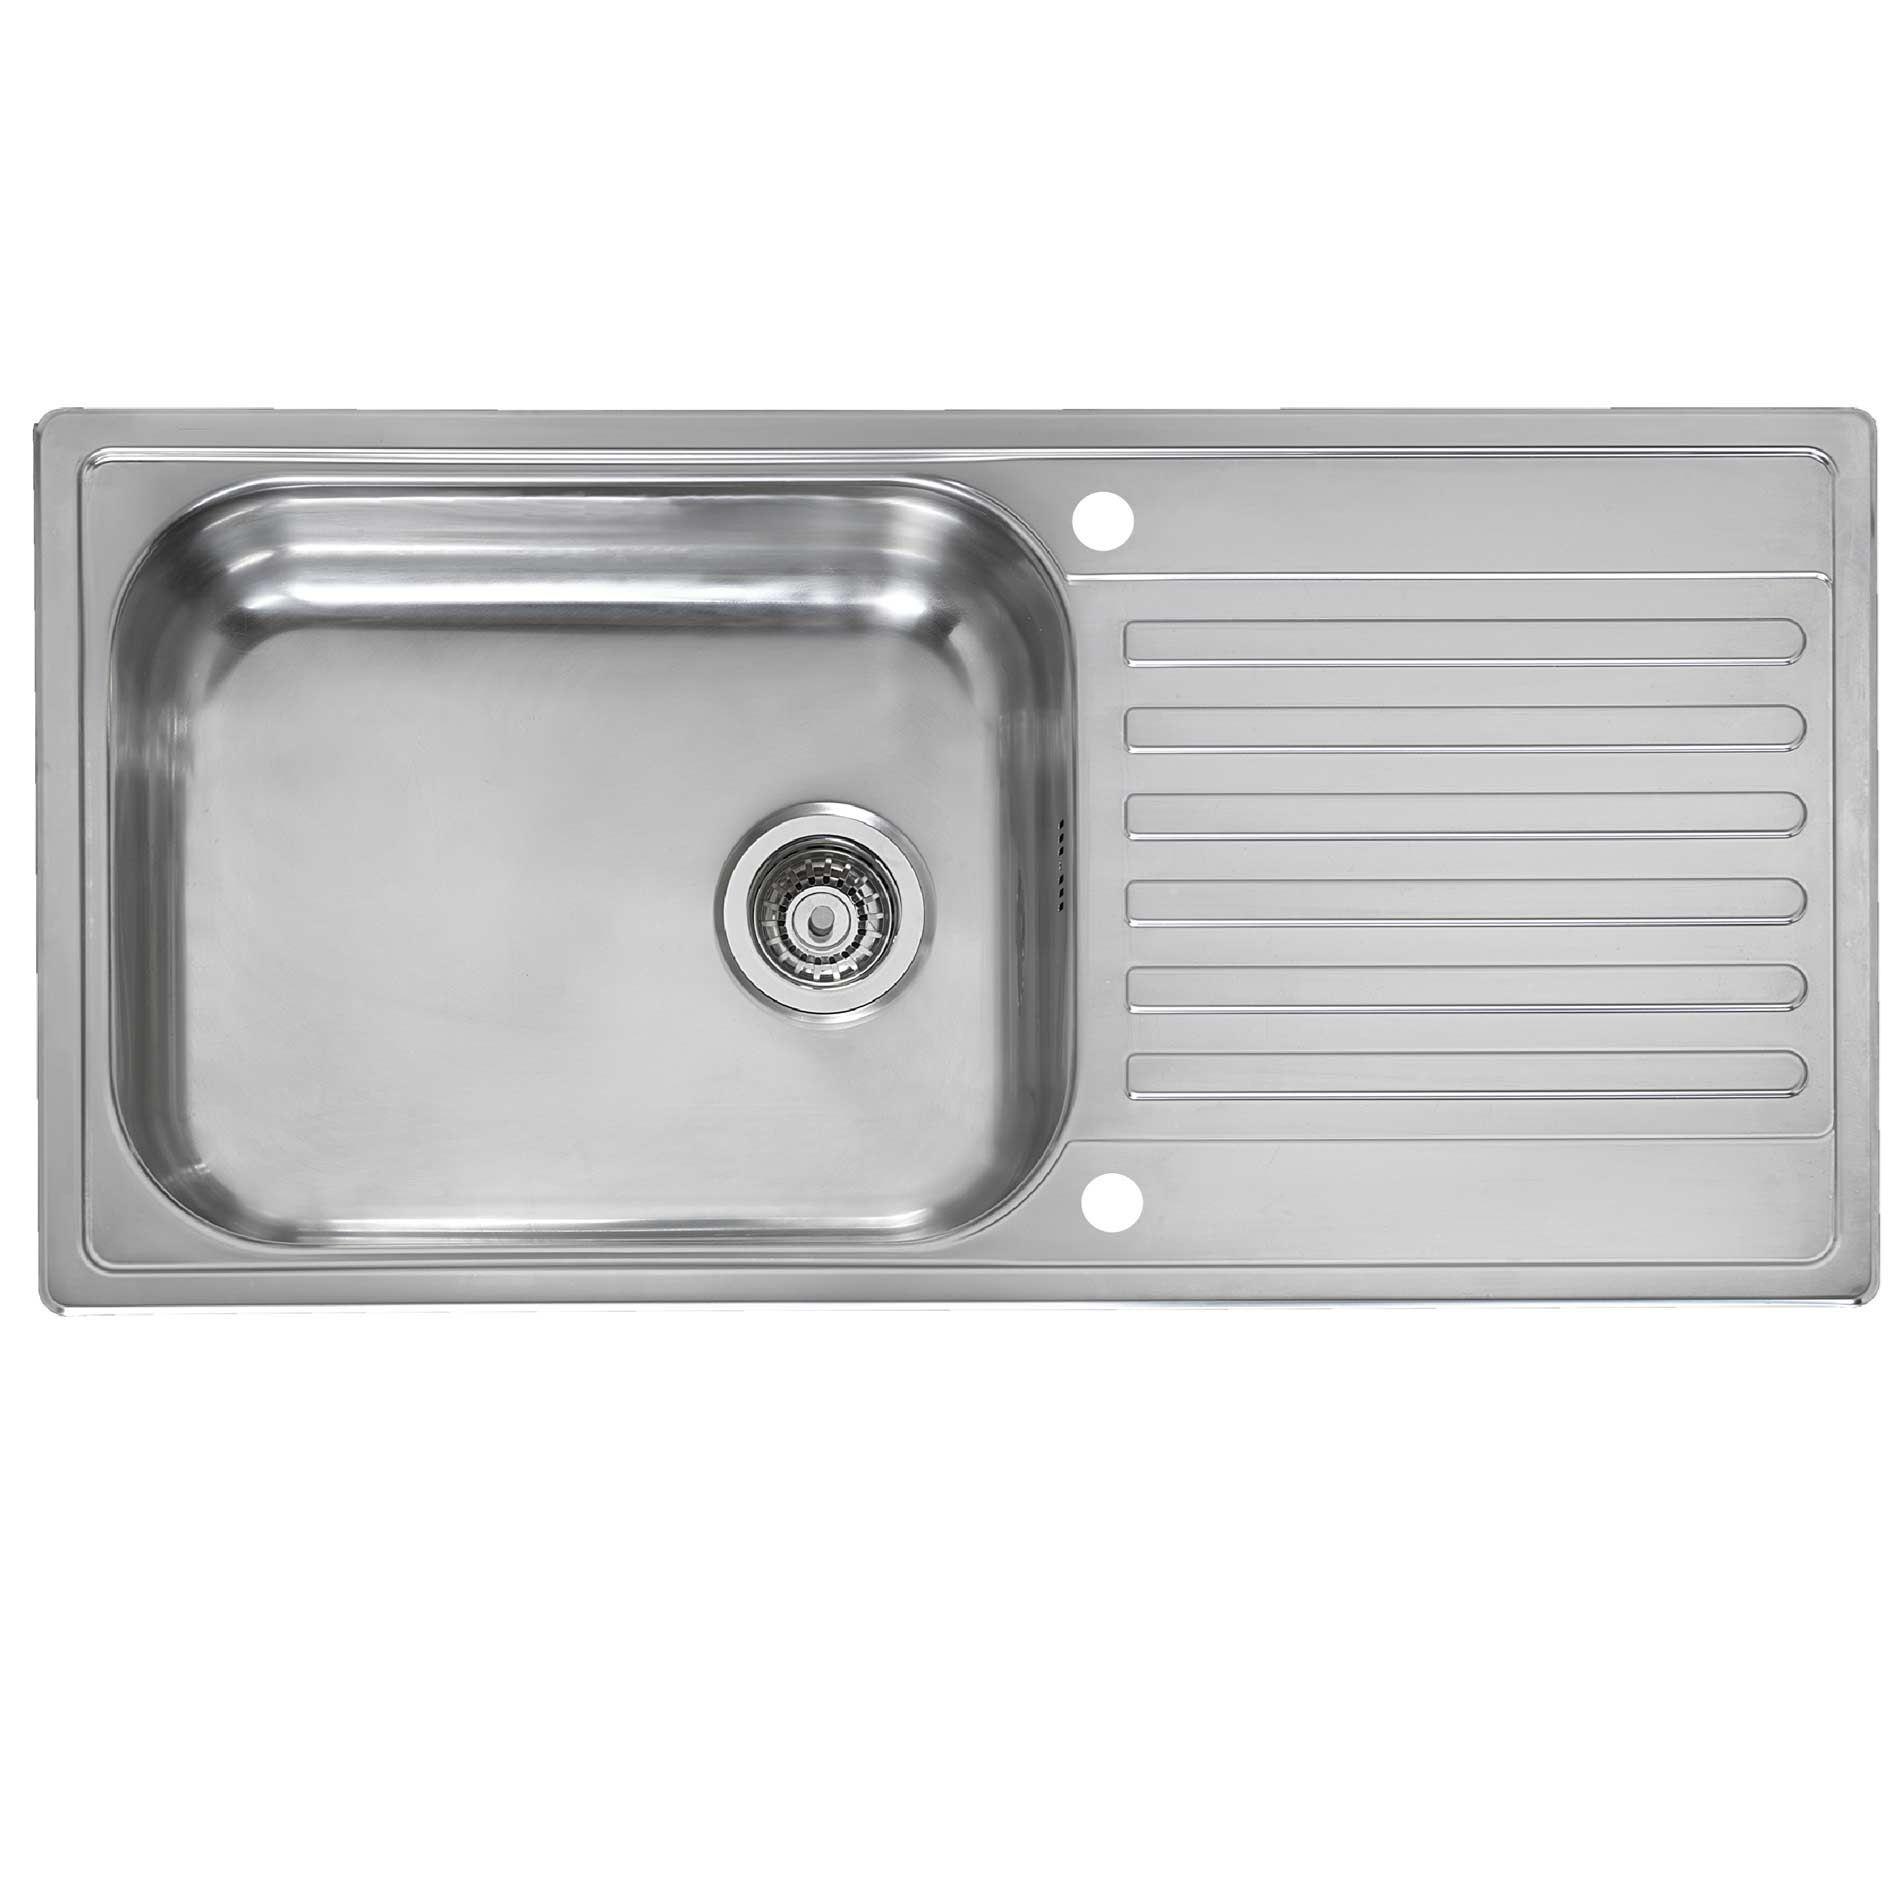 Reginox: Minister Reversible Stainless Steel Sink - Kitchen Sinks ...